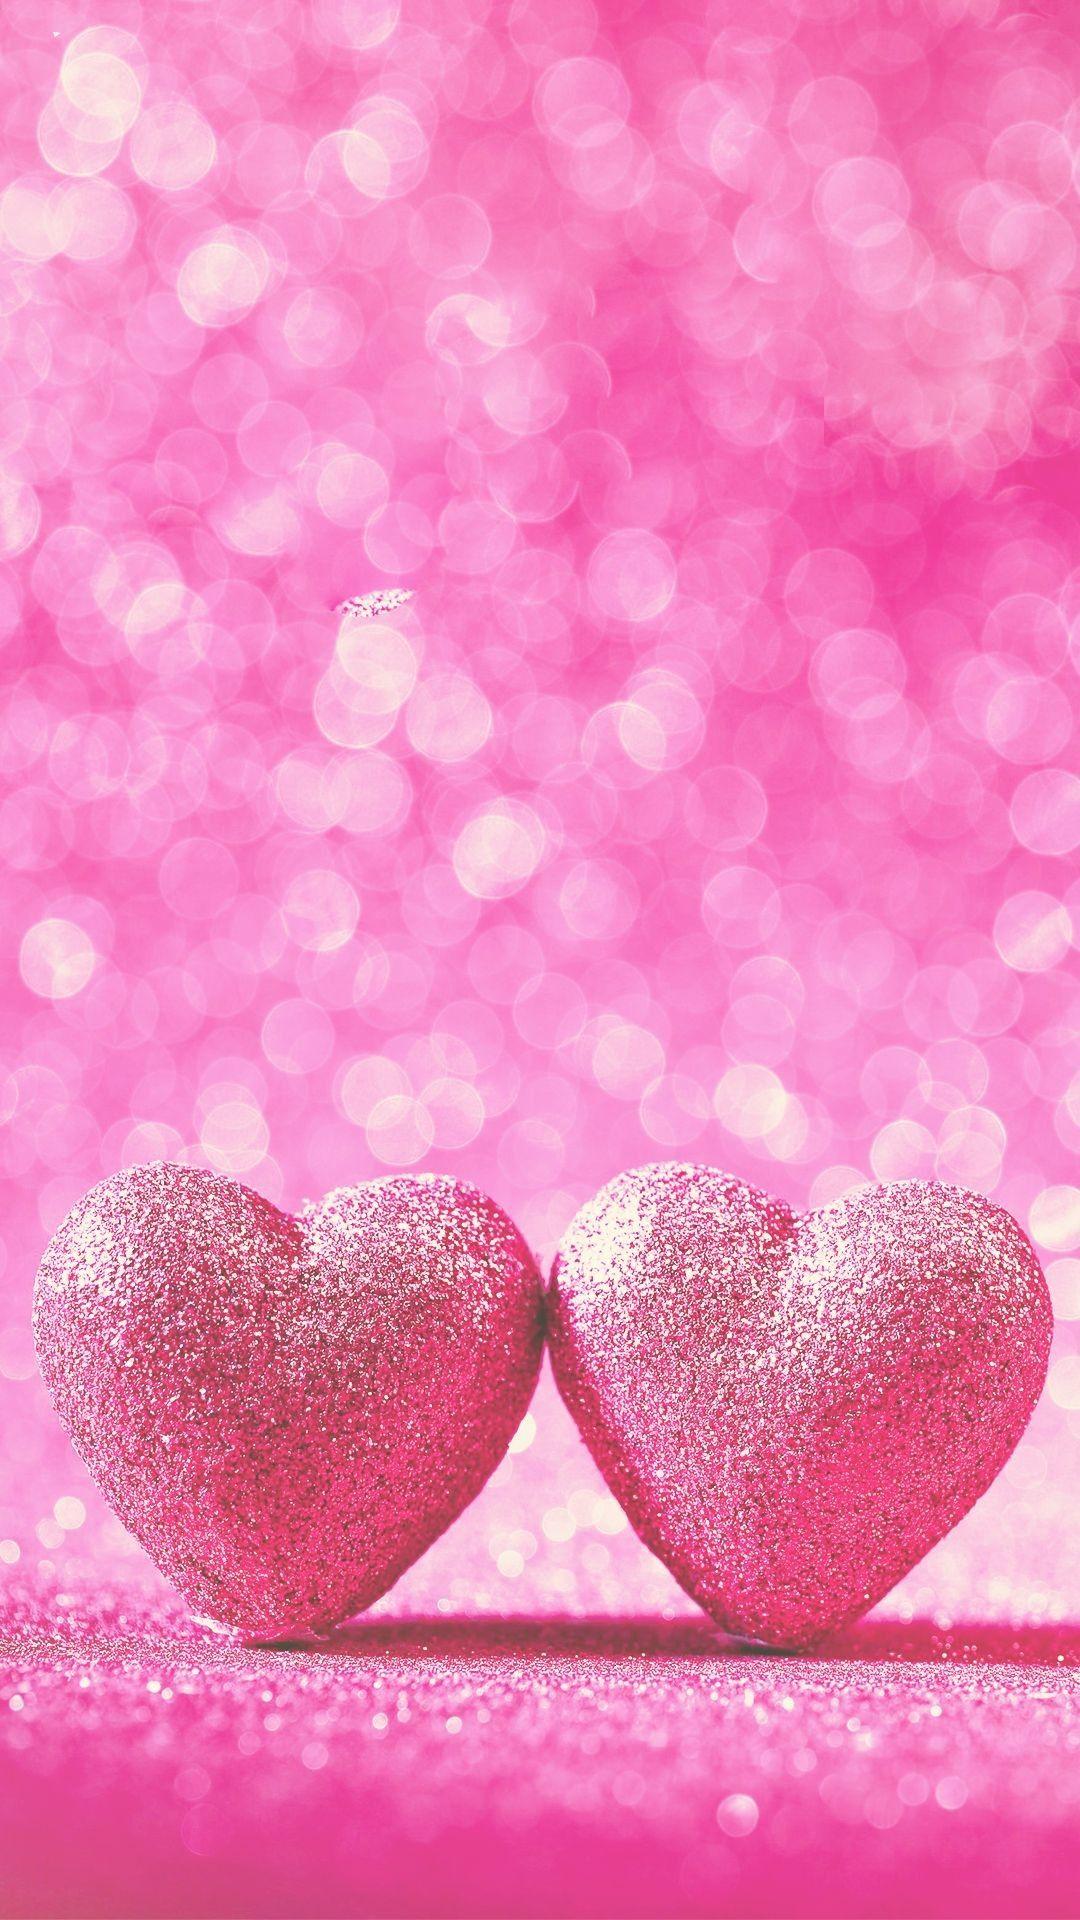 Love iphone cute pink hd wallpaper